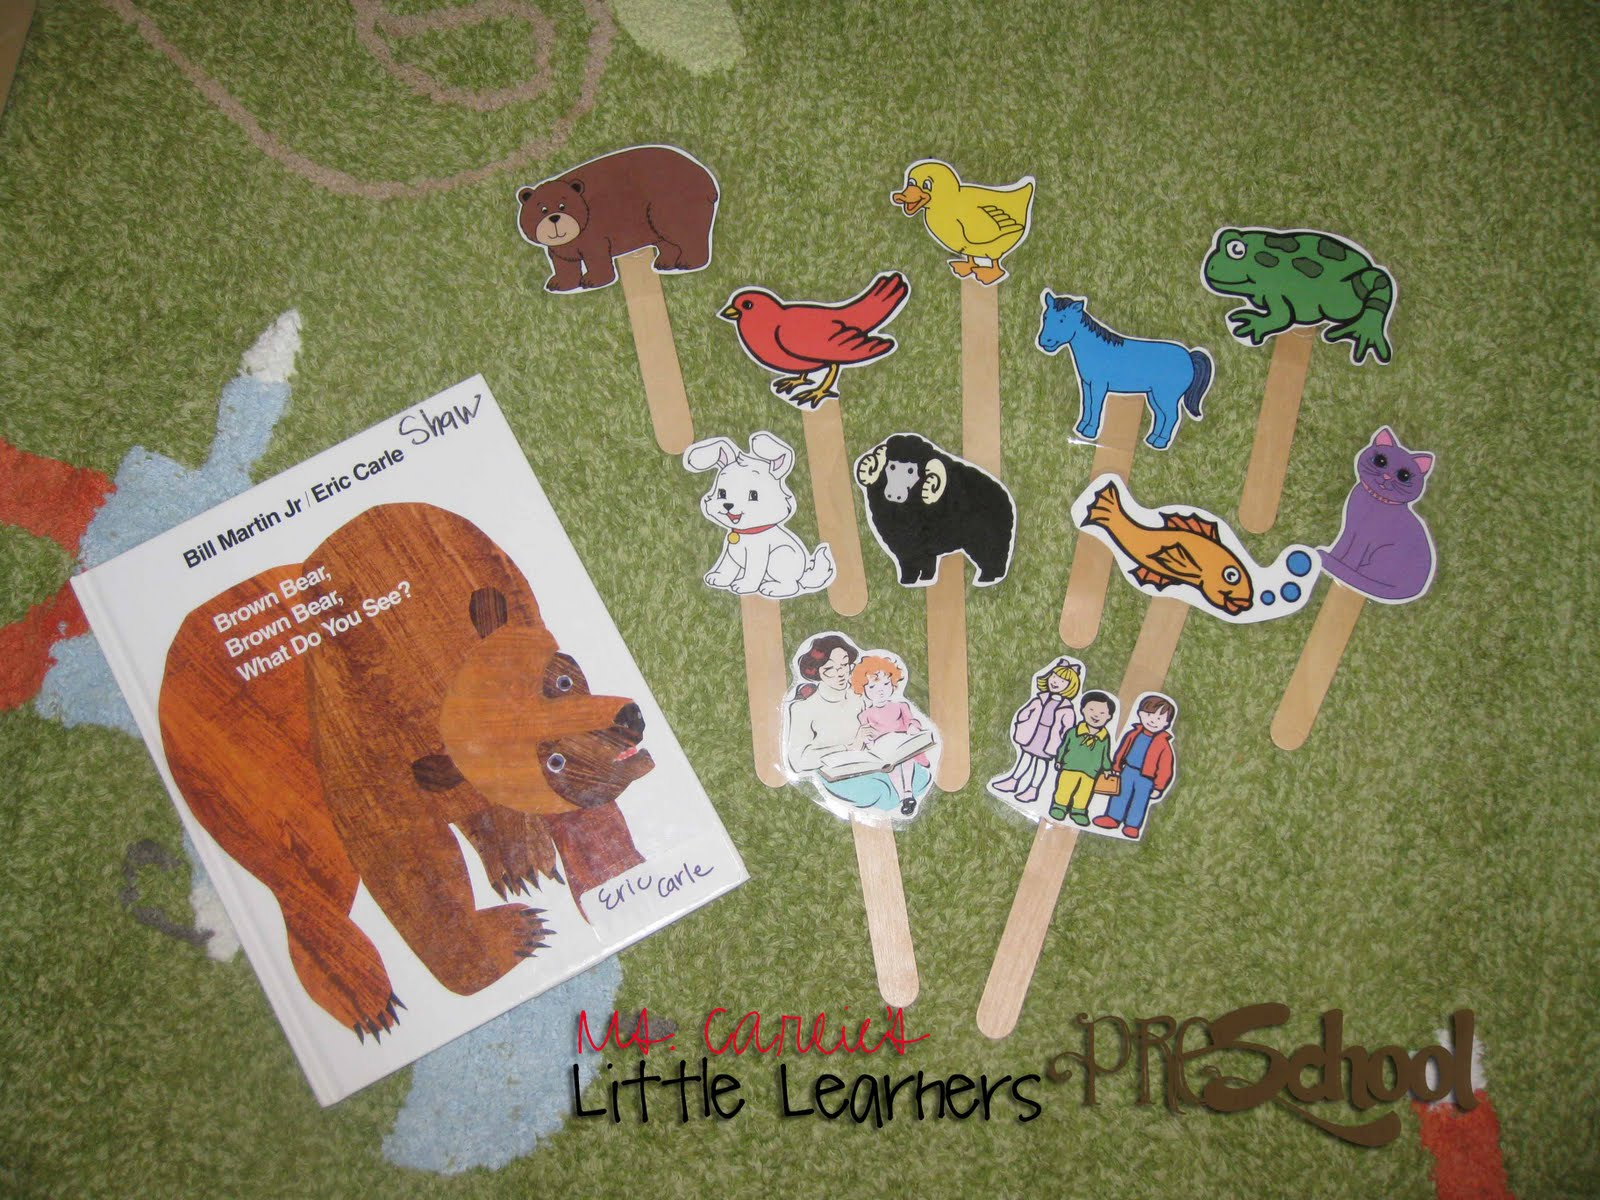 Ms Carlie S Little Learners Preschool September Week One